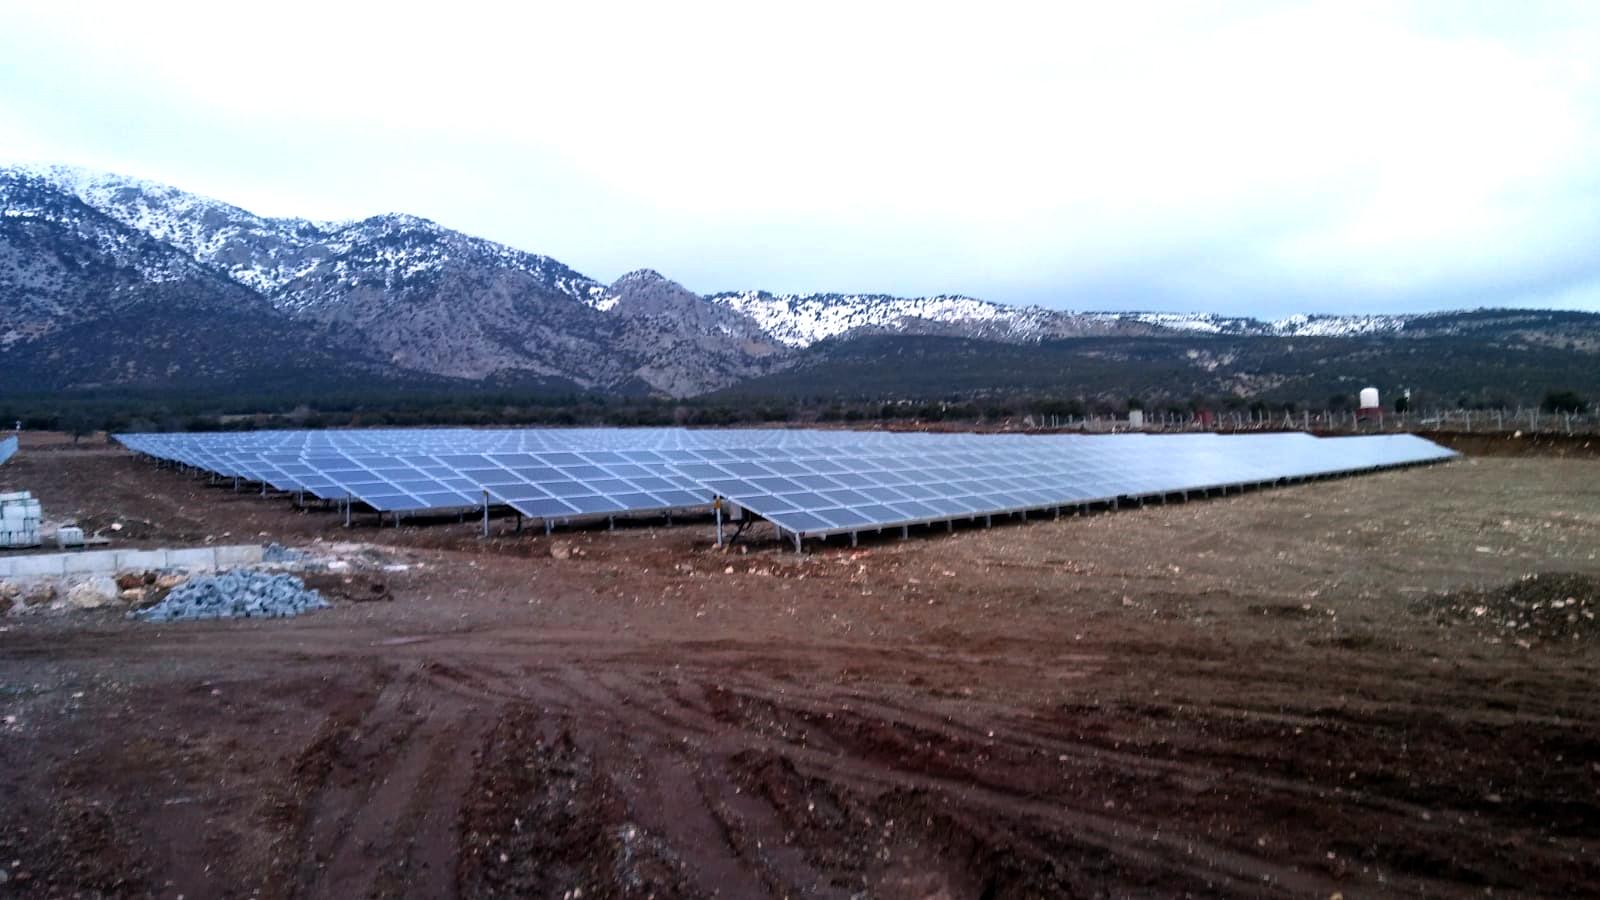 KUZÖREN SOLAR POWER PLANT